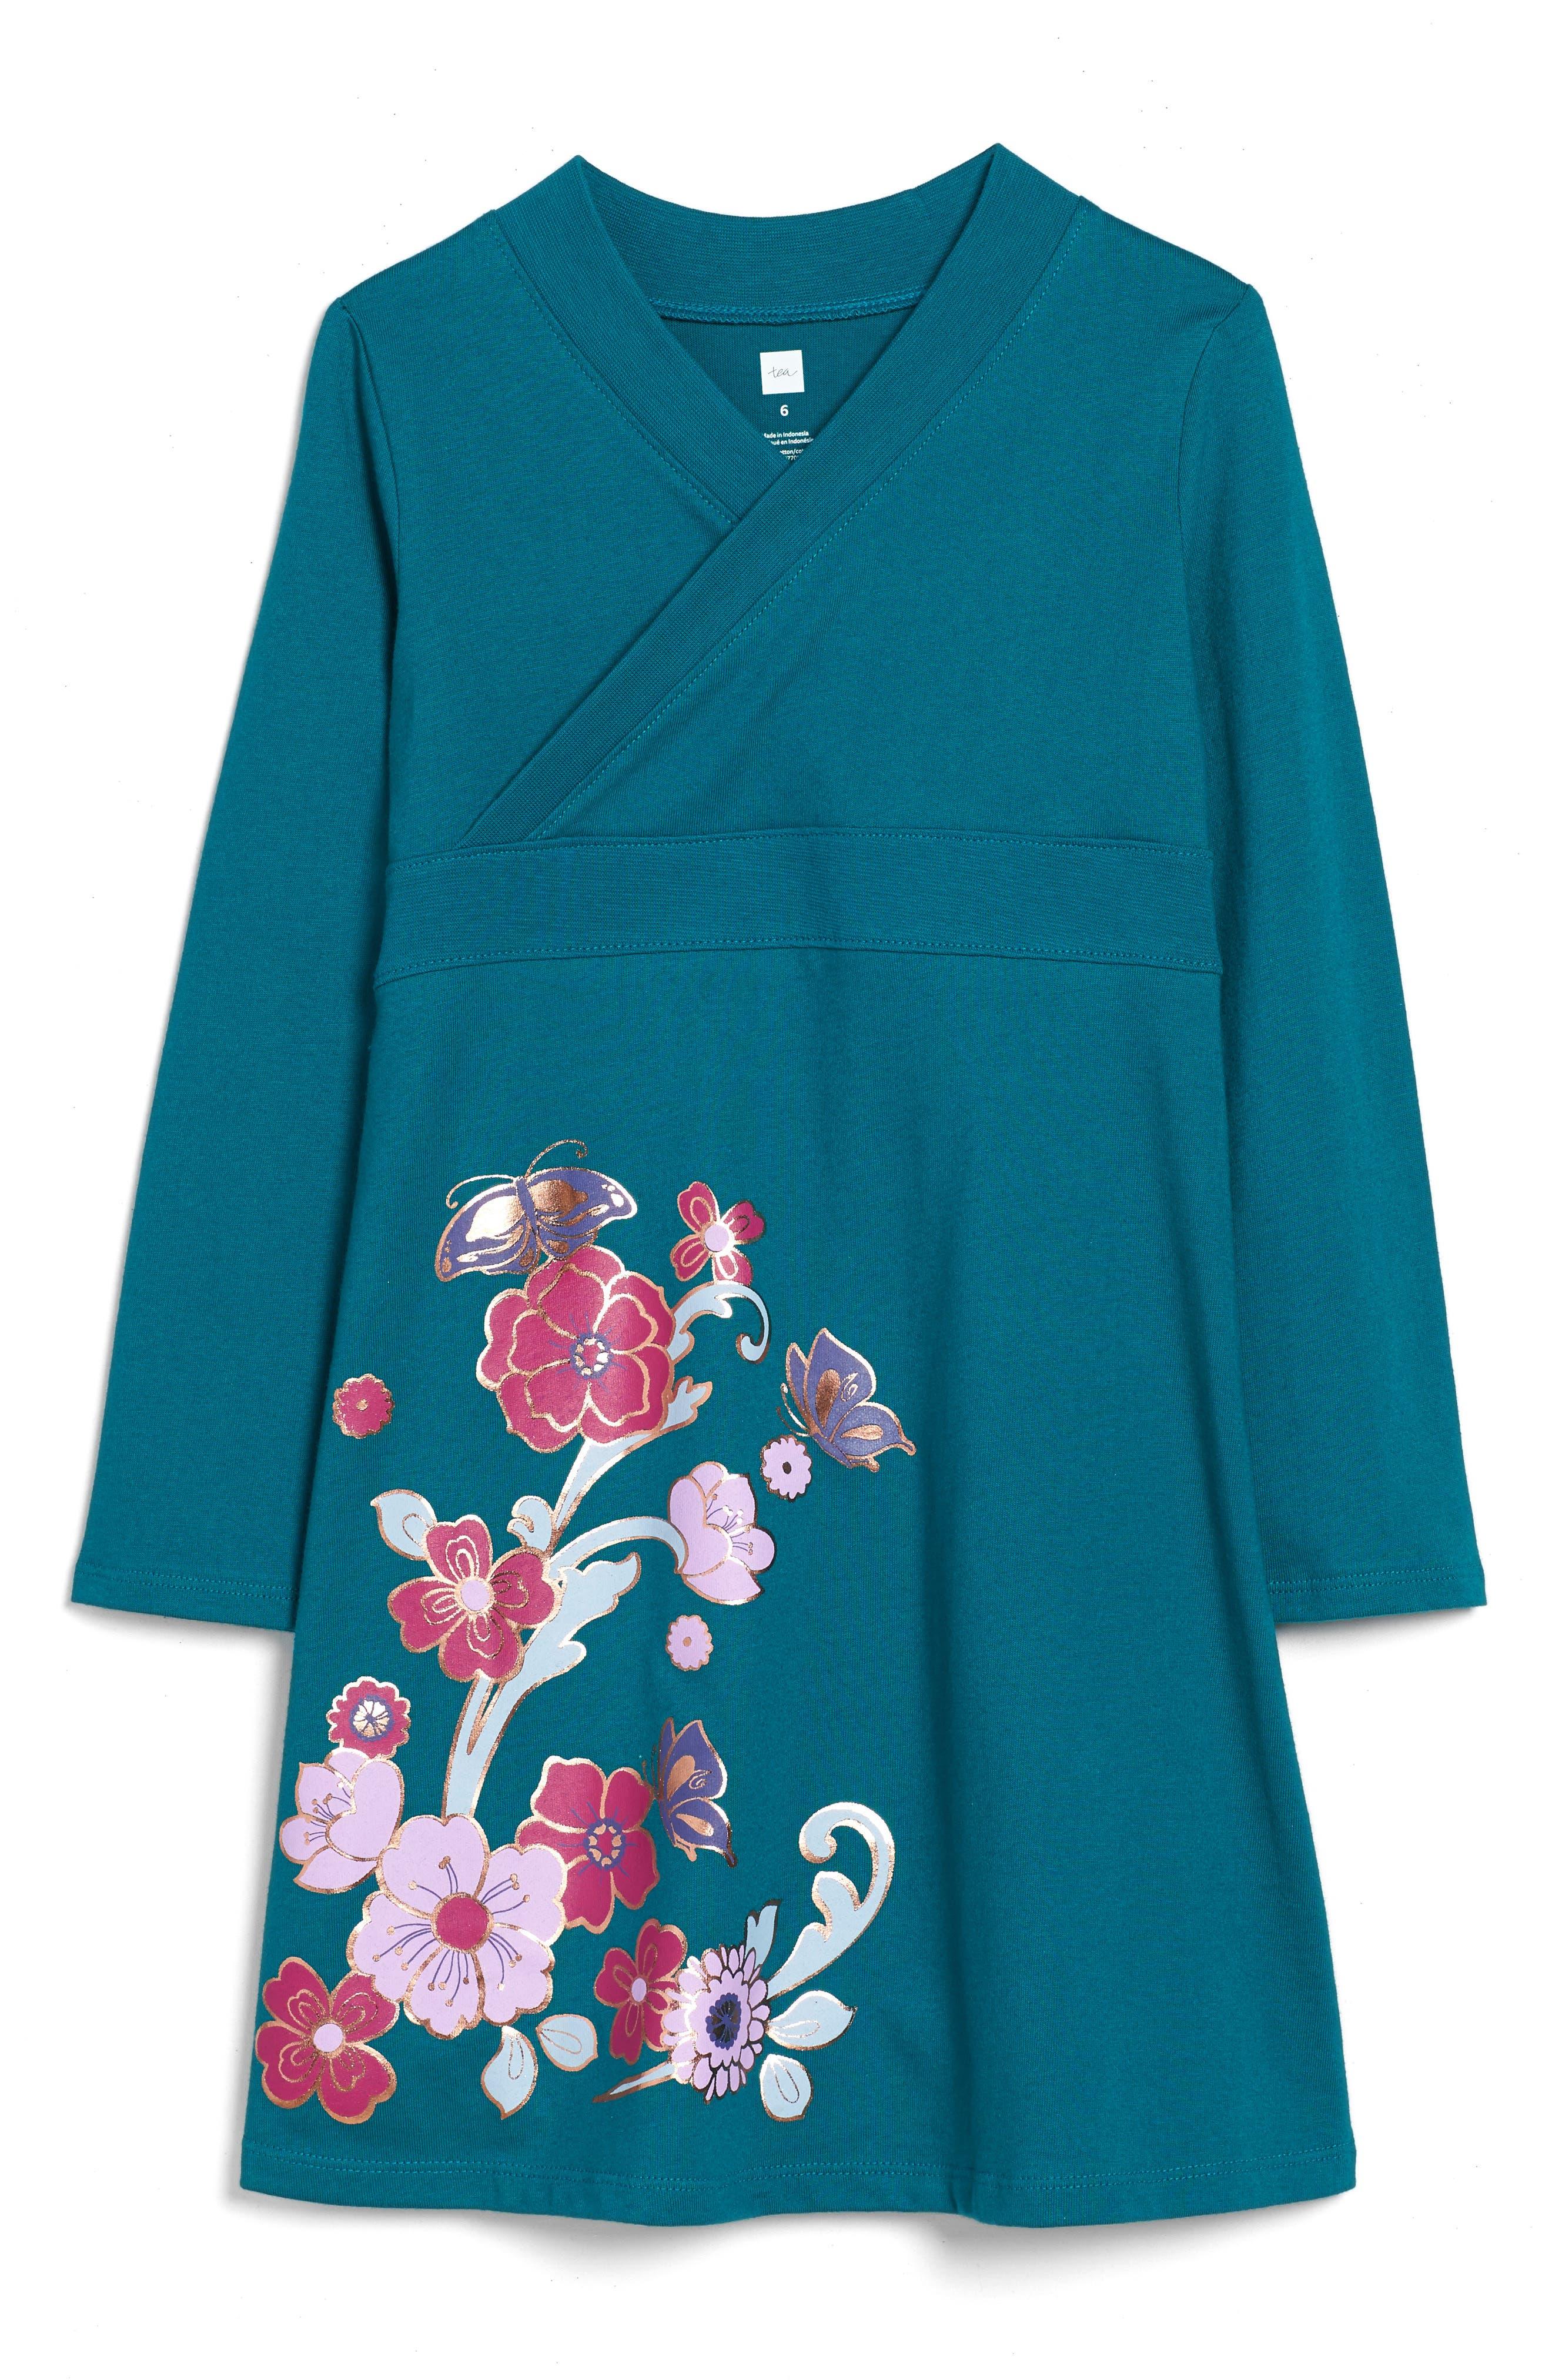 Alternate Image 1 Selected - Tea Collection Ingram Street Print Wrap Neck Dress (Toddler Girls, Little Girls & Big Girls)